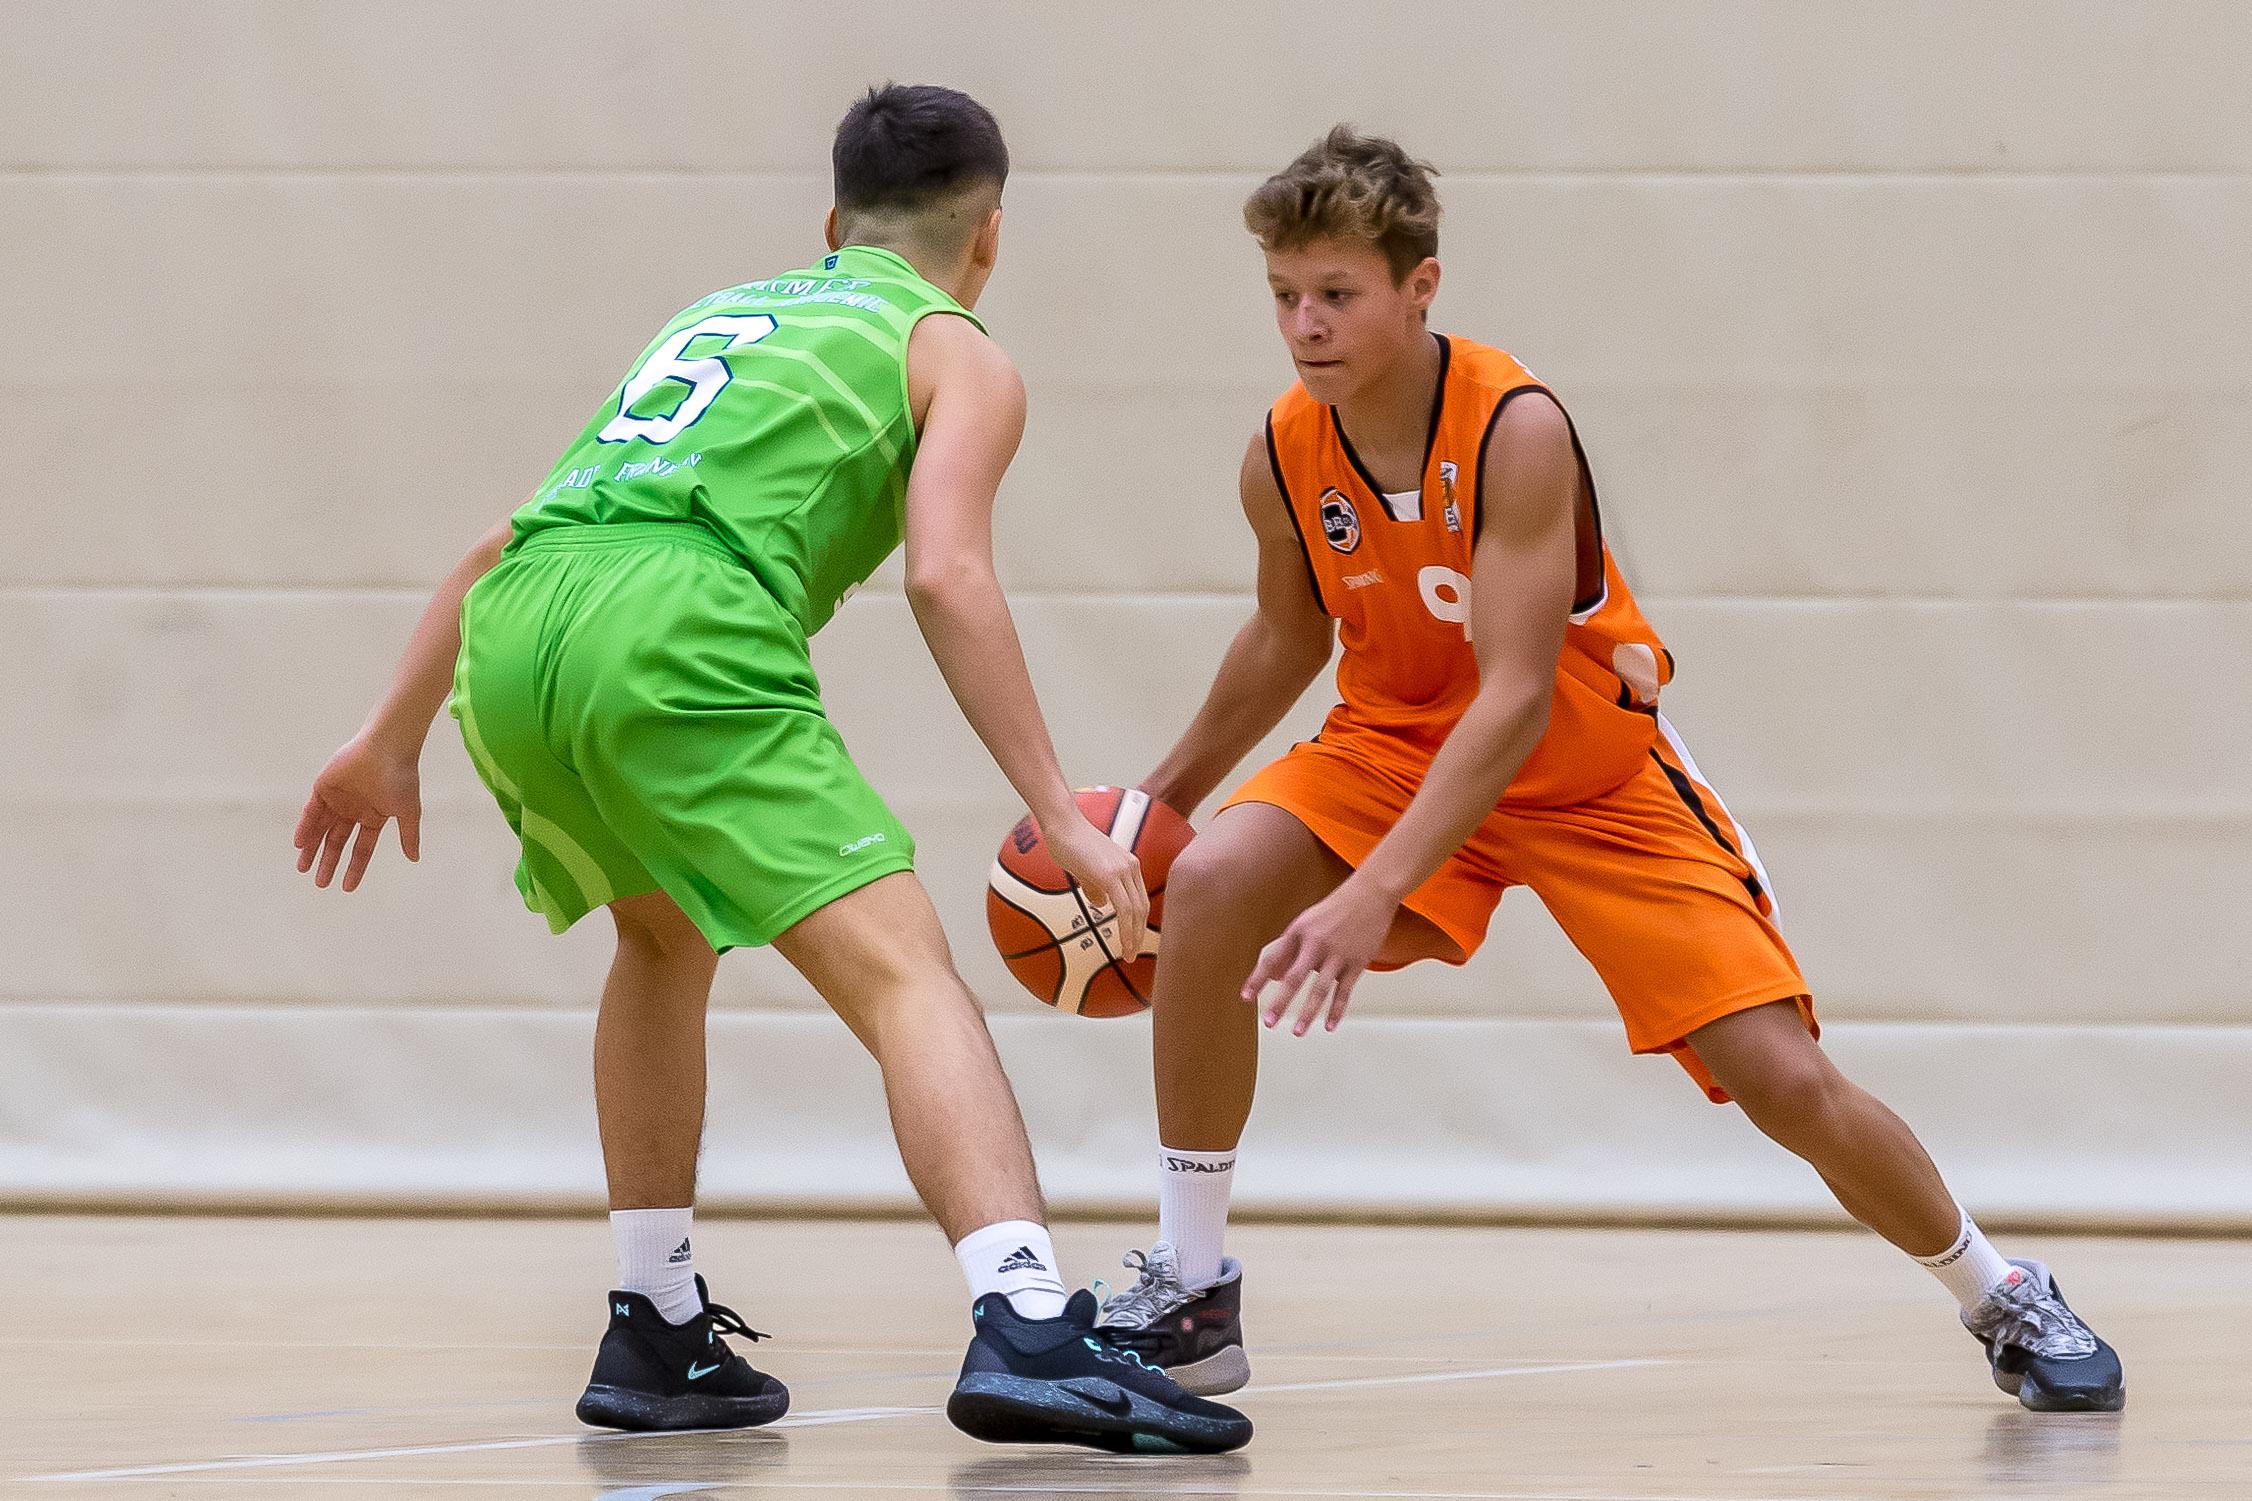 JBBL_19-20_OrangeAcademy_TORNADOS-FRANKEN_Spieltag2_Simon-Scheible